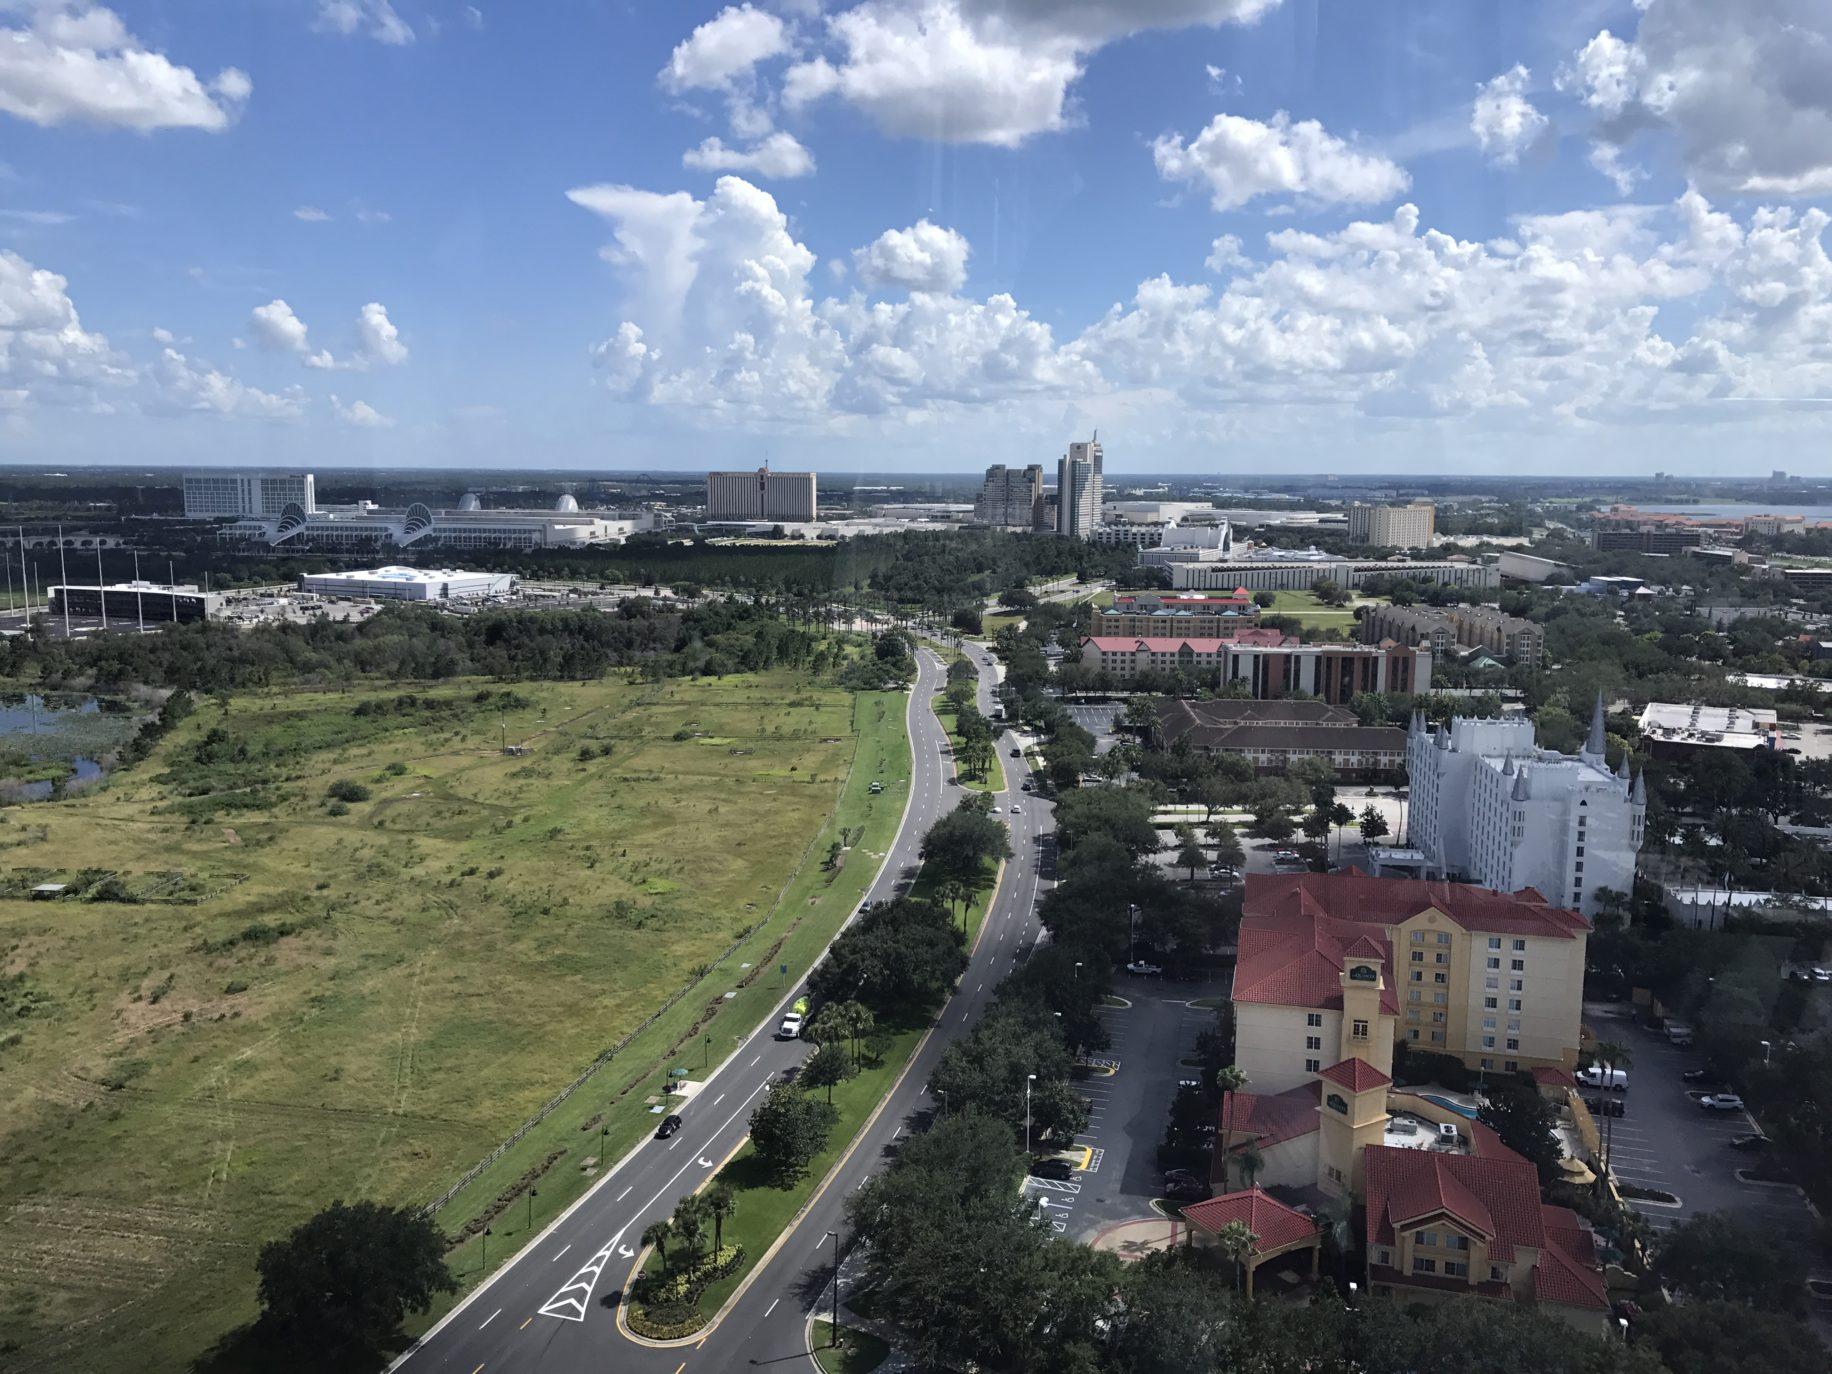 What a view right?  Image: Dakster Sullivan